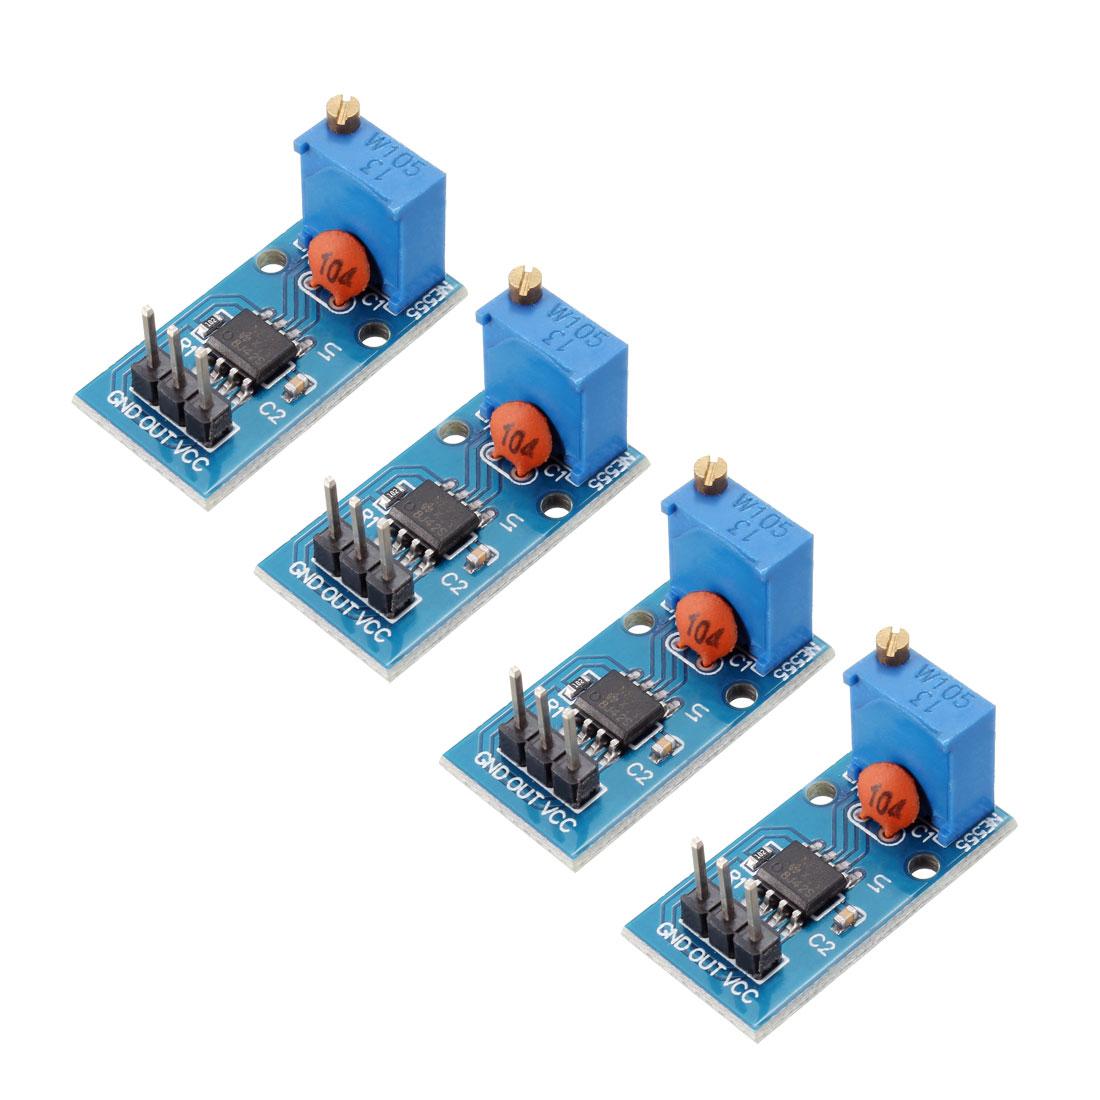 DC5-12V NE555 Square Wave Output Pulse Adjustable Frequency Module 4pcs